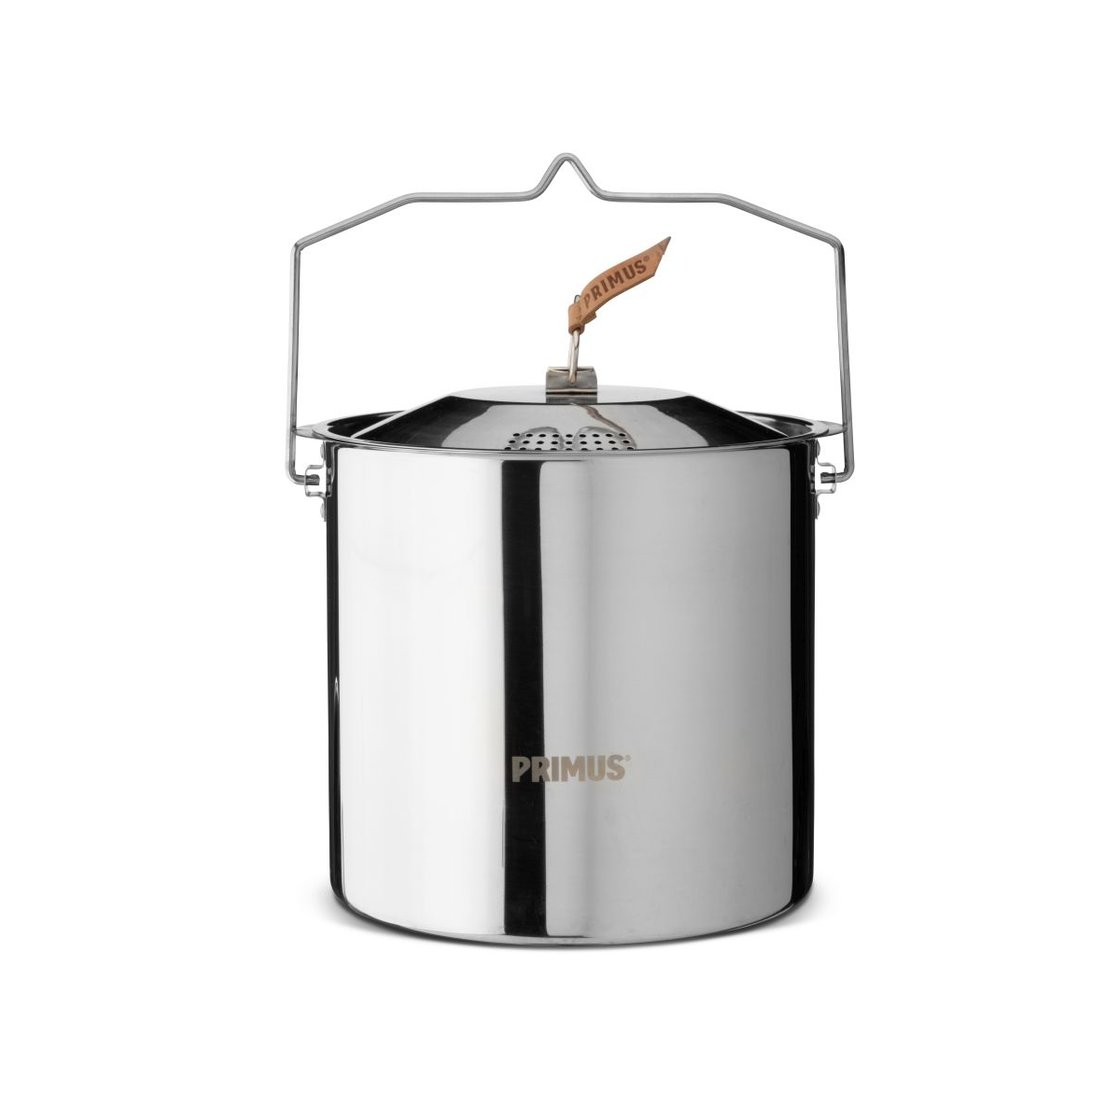 primus edelstahltopf 39 campfire 39 5 liter outdoor ausr stung rucks. Black Bedroom Furniture Sets. Home Design Ideas